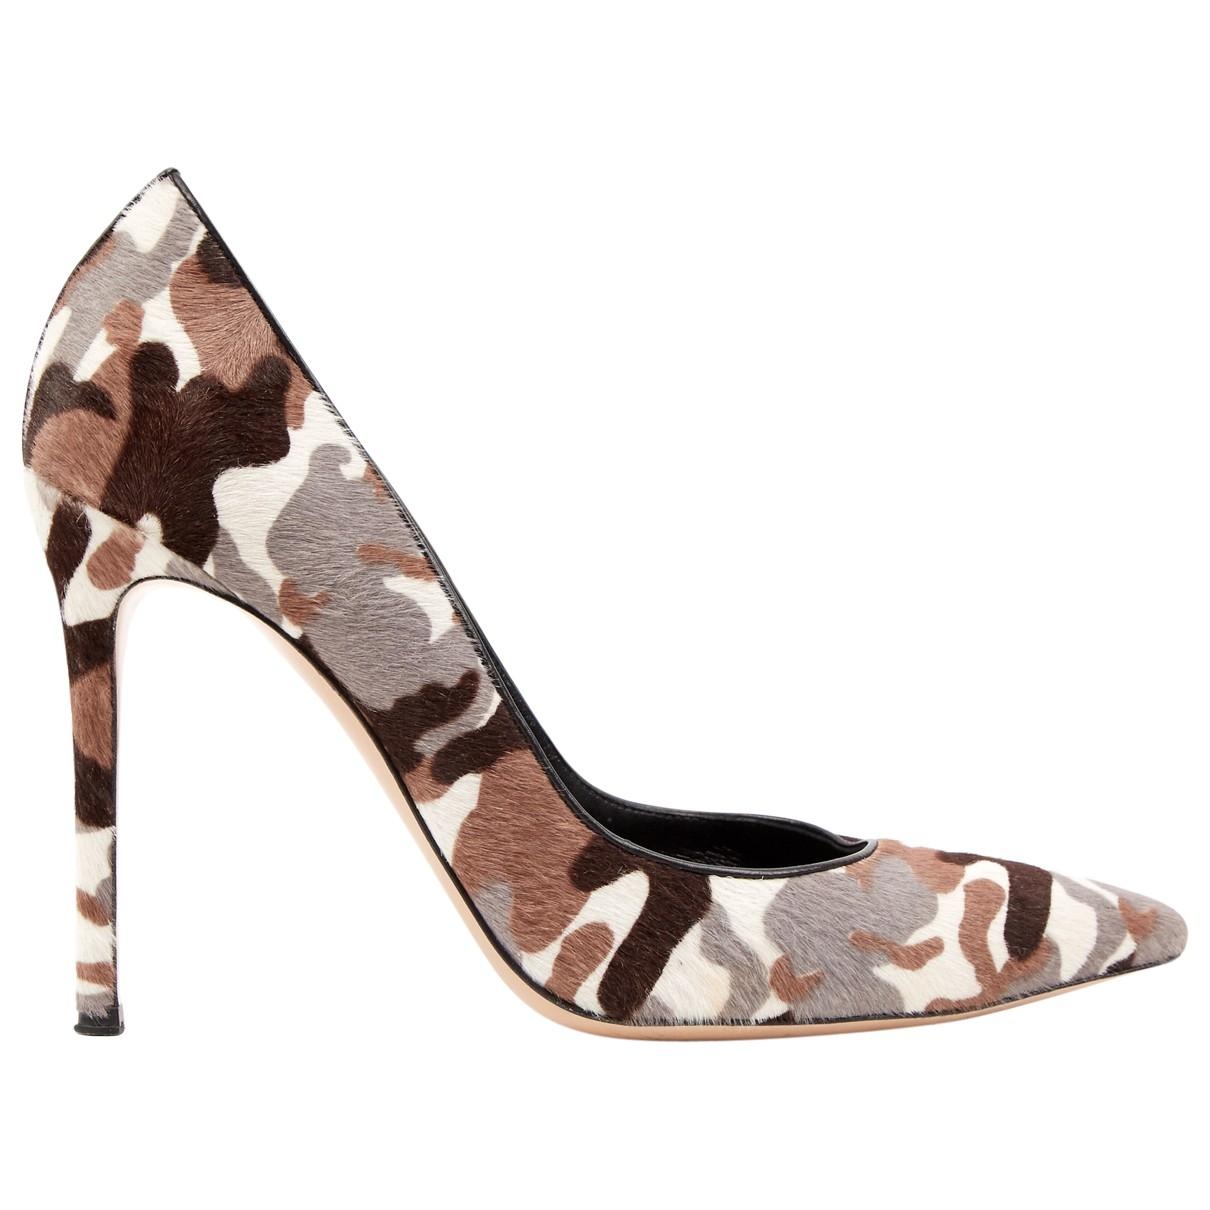 Gianvito Rossi \N Brown Pony-style calfskin Heels for Women 40 EU